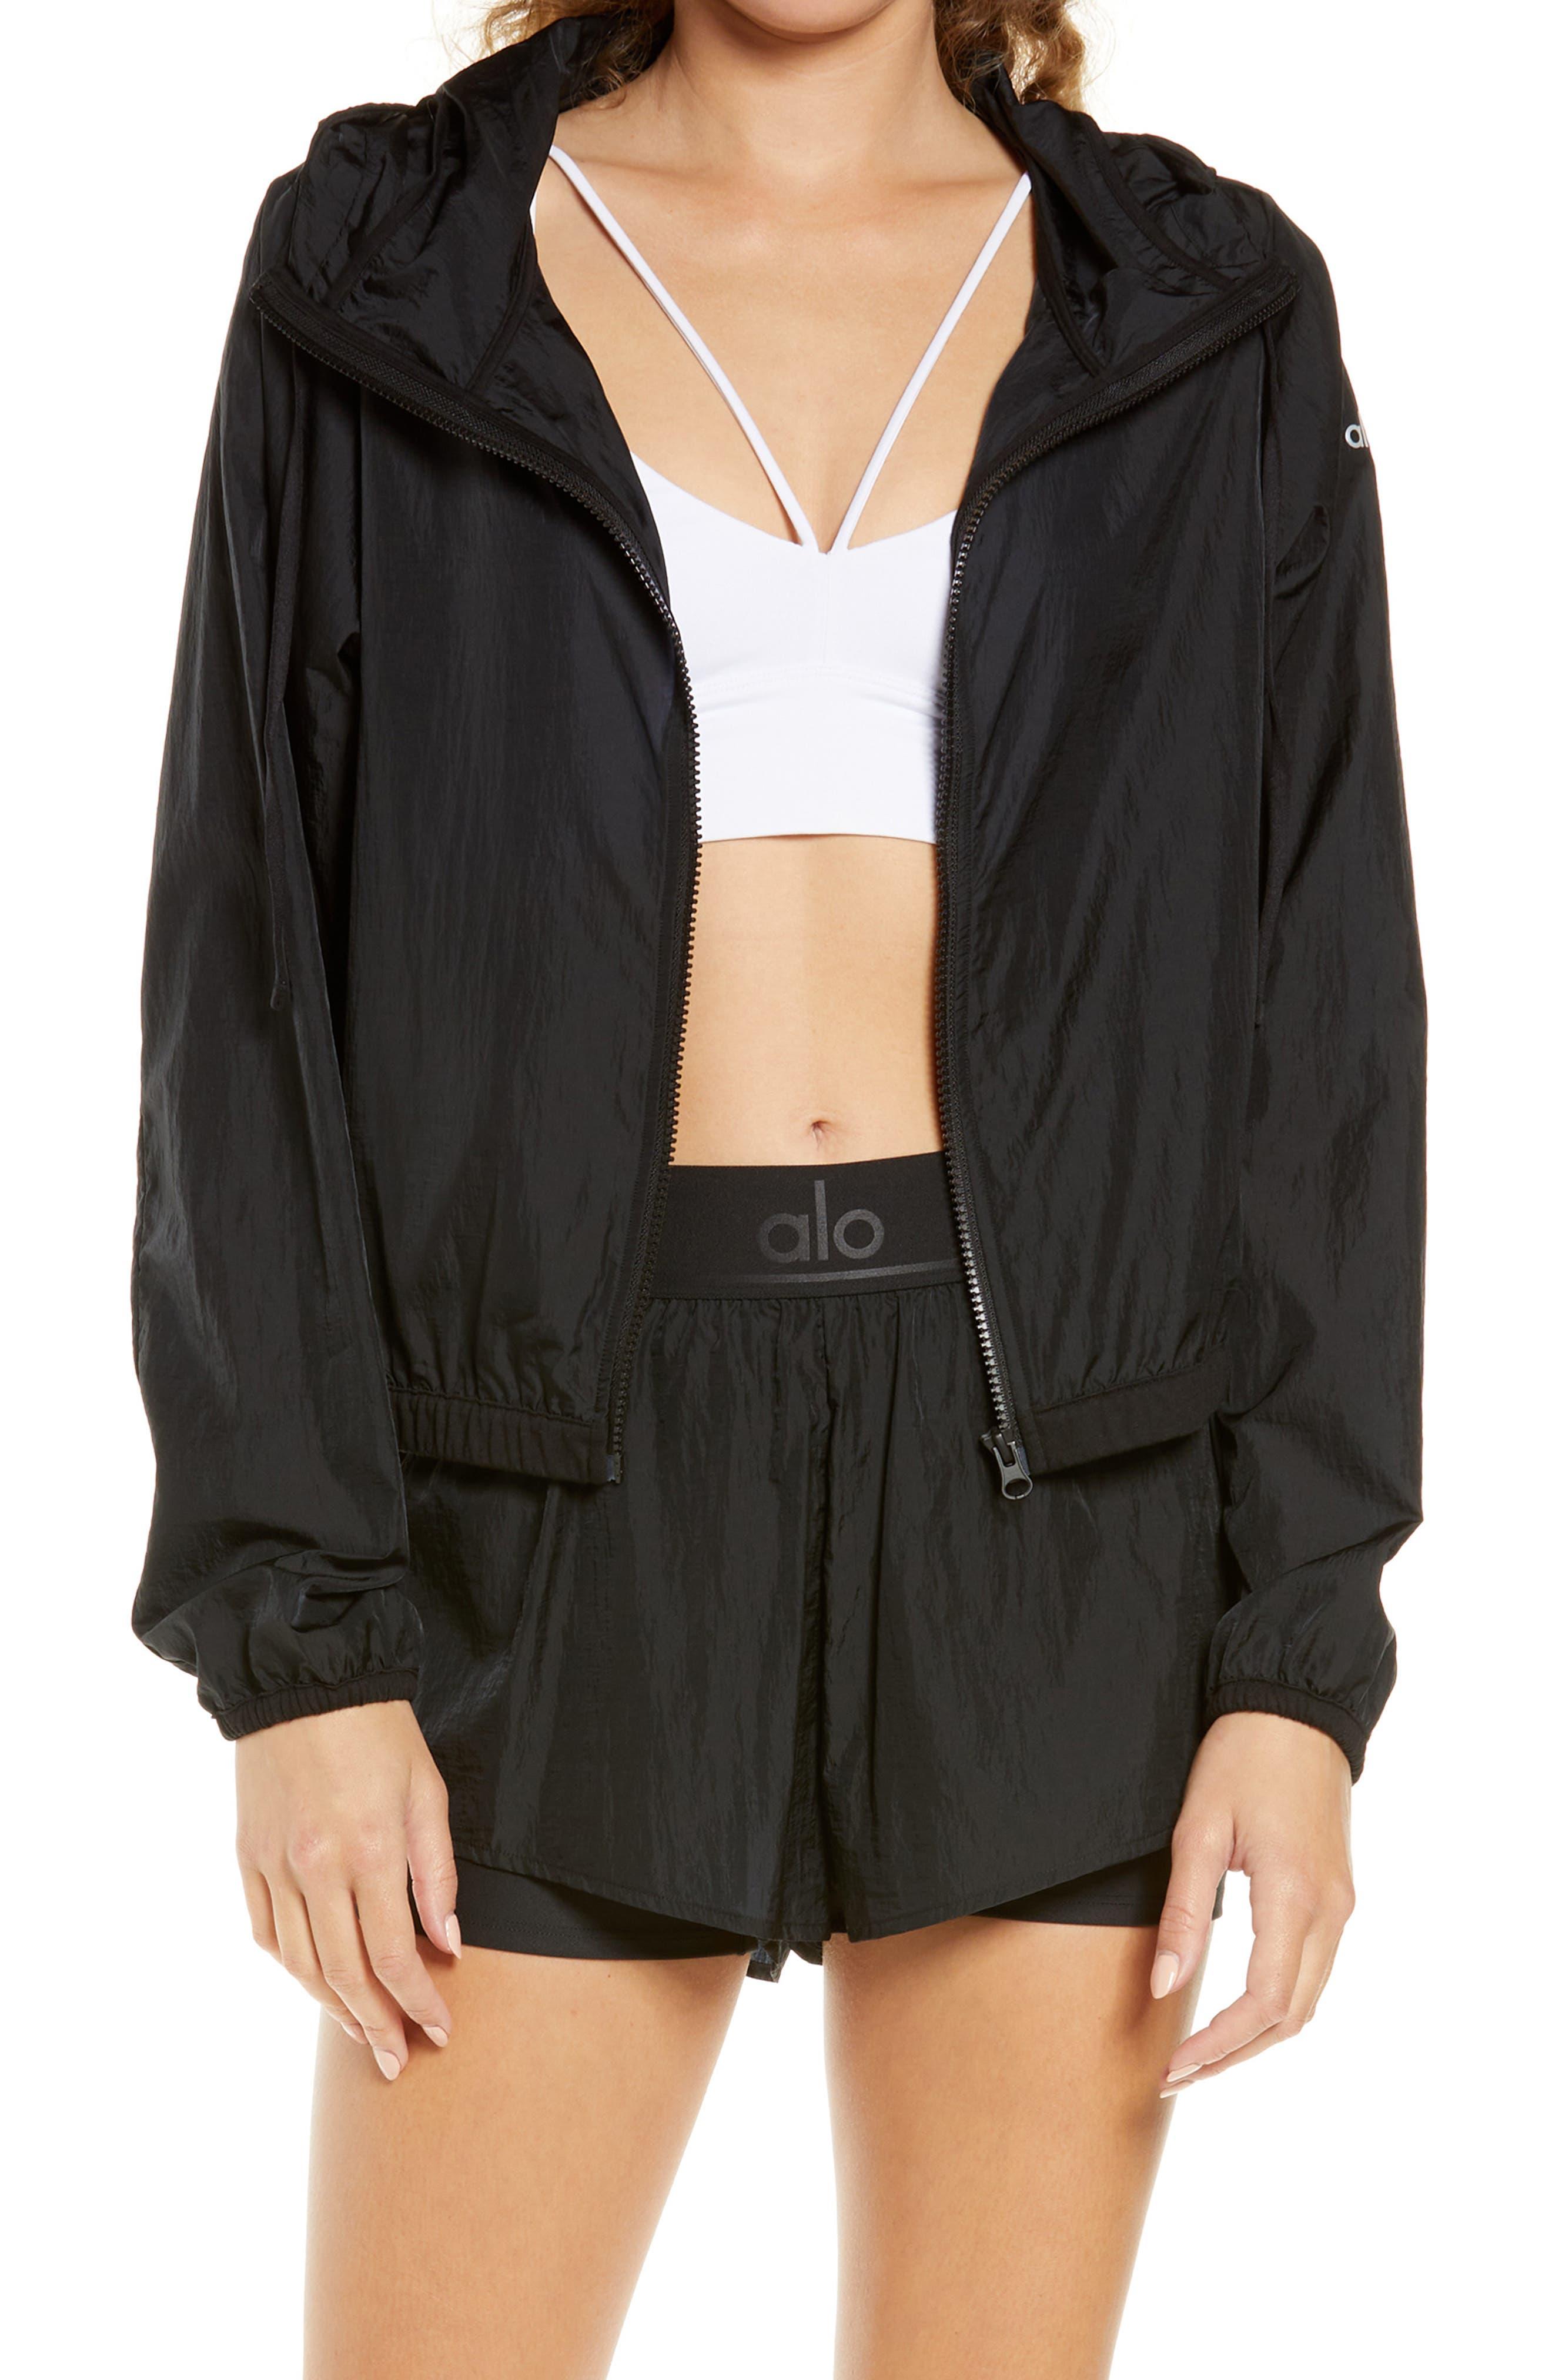 Light Hooded Zip Jacket